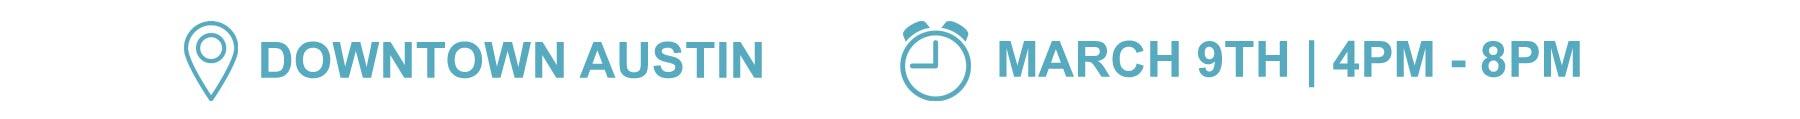 Time_Location_Crawl_SX18.jpg